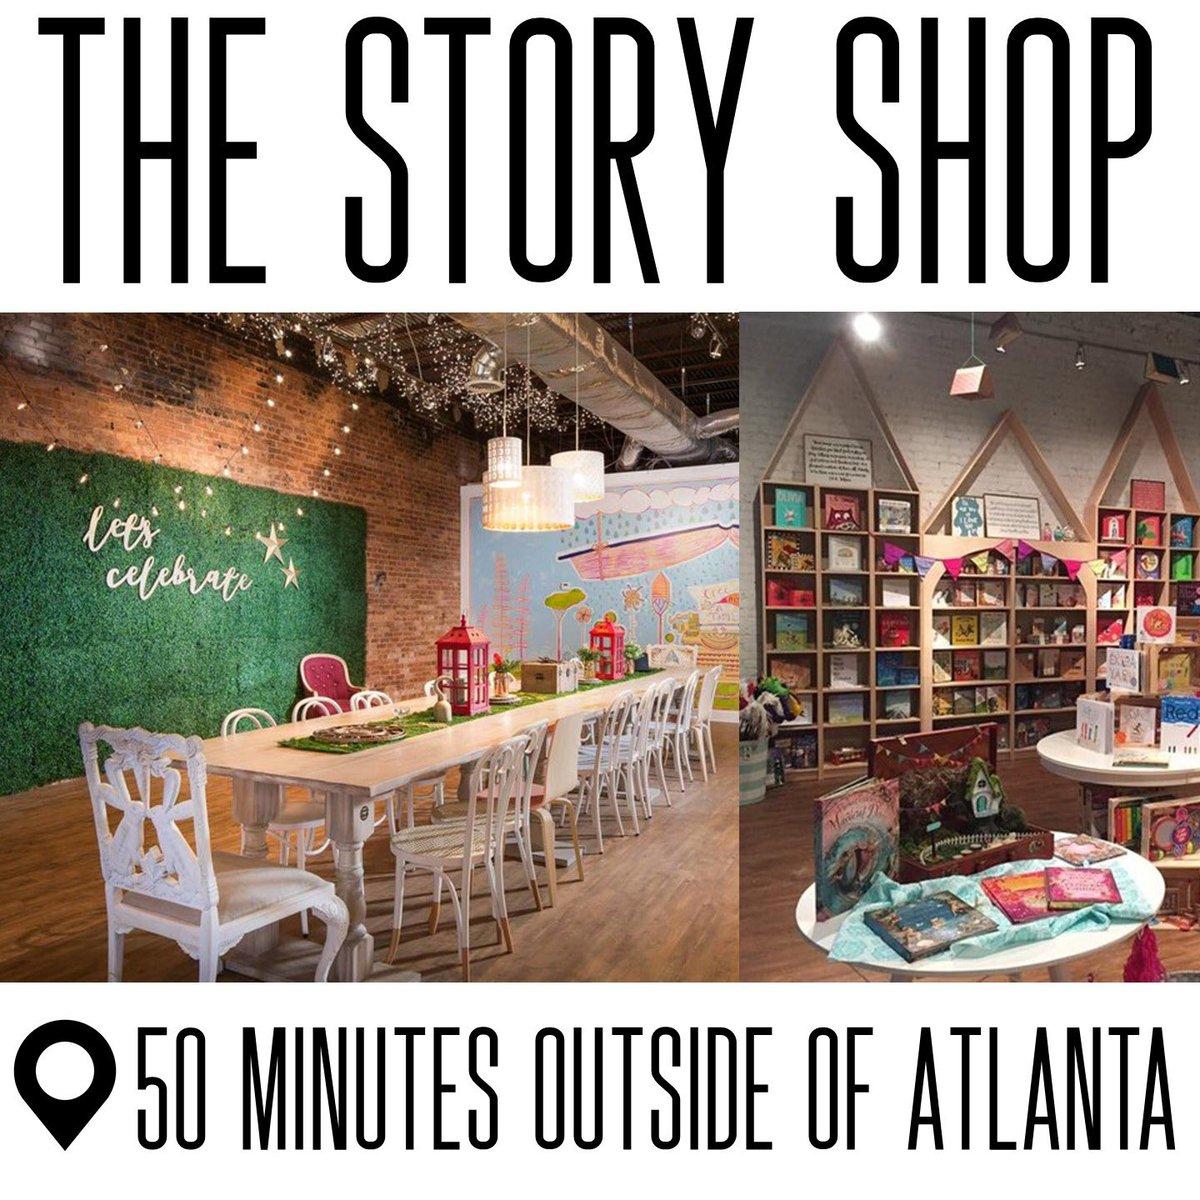 2af5435e3ce9 Register here  https   www.eventbrite.com e keeping-the-wonder -a-secondary-ela-workshop-at-a-magical-bookstore-tickets-46293497096  …pic.twitter.com  ...